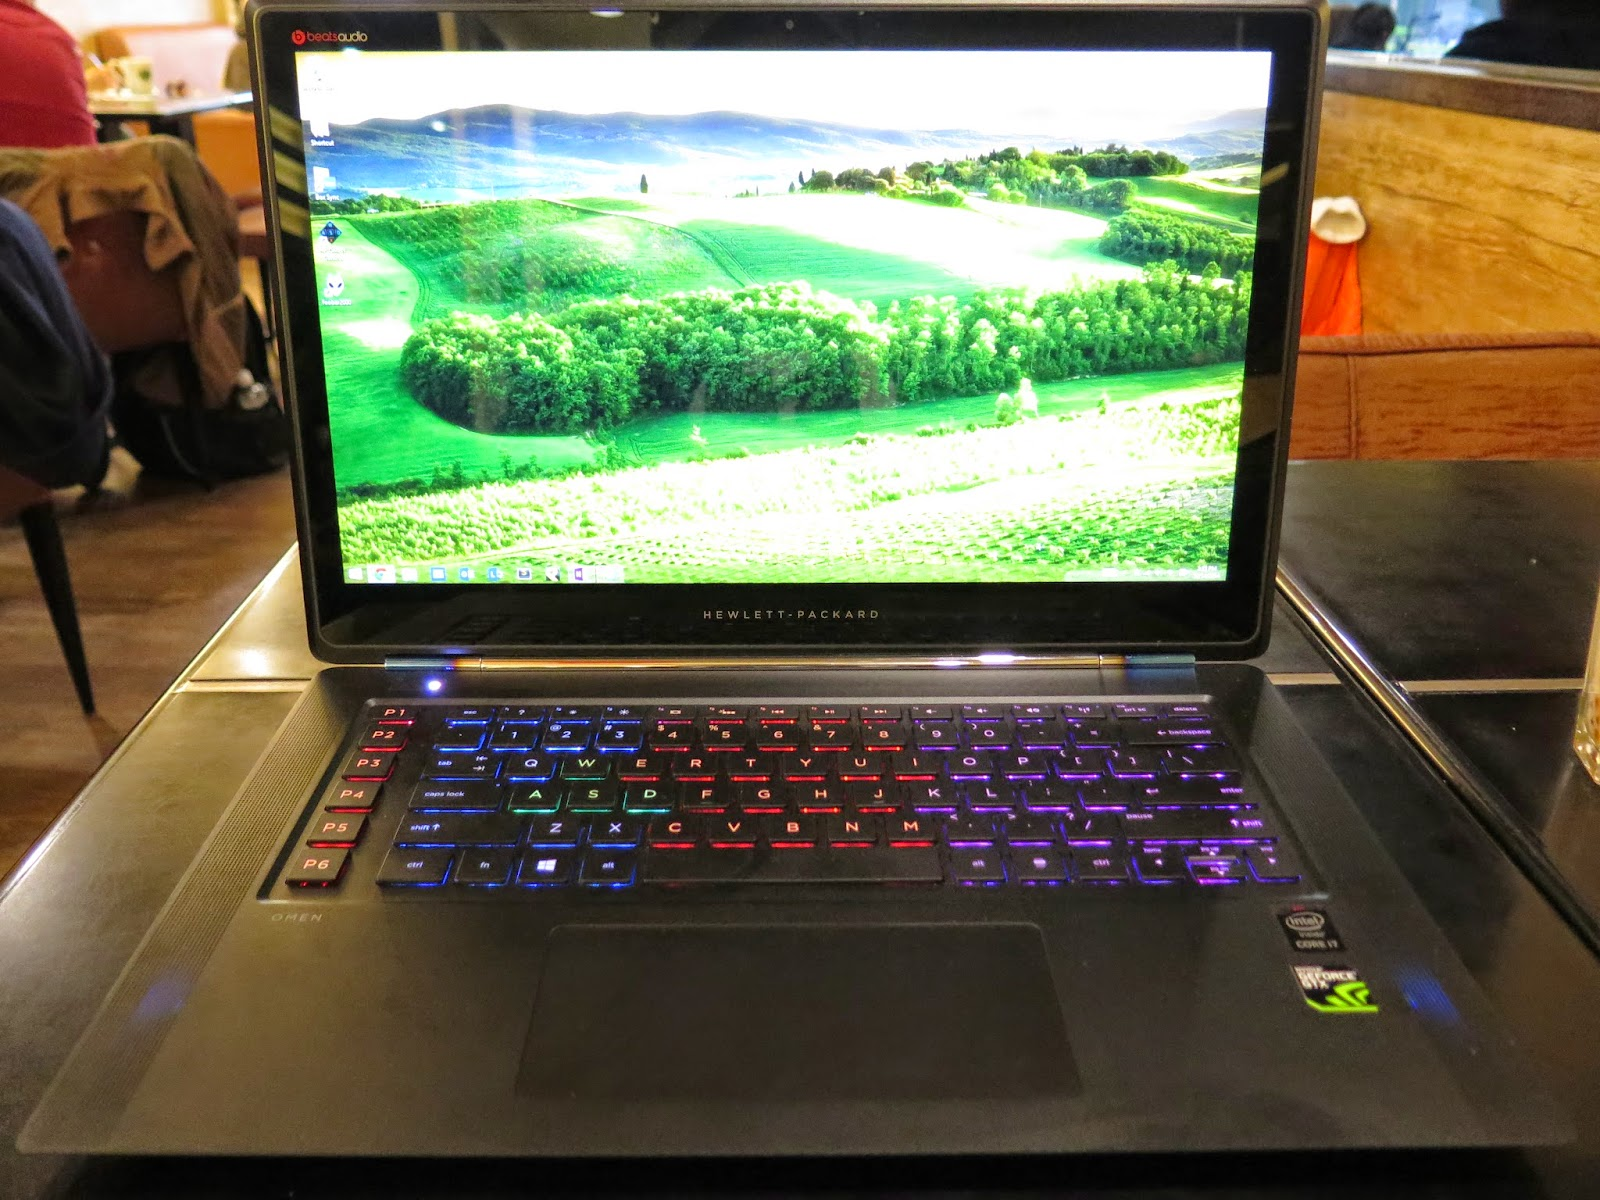 鳥仔的CCCSky~: HP OMEN 15 Gaming Laptop unboxing